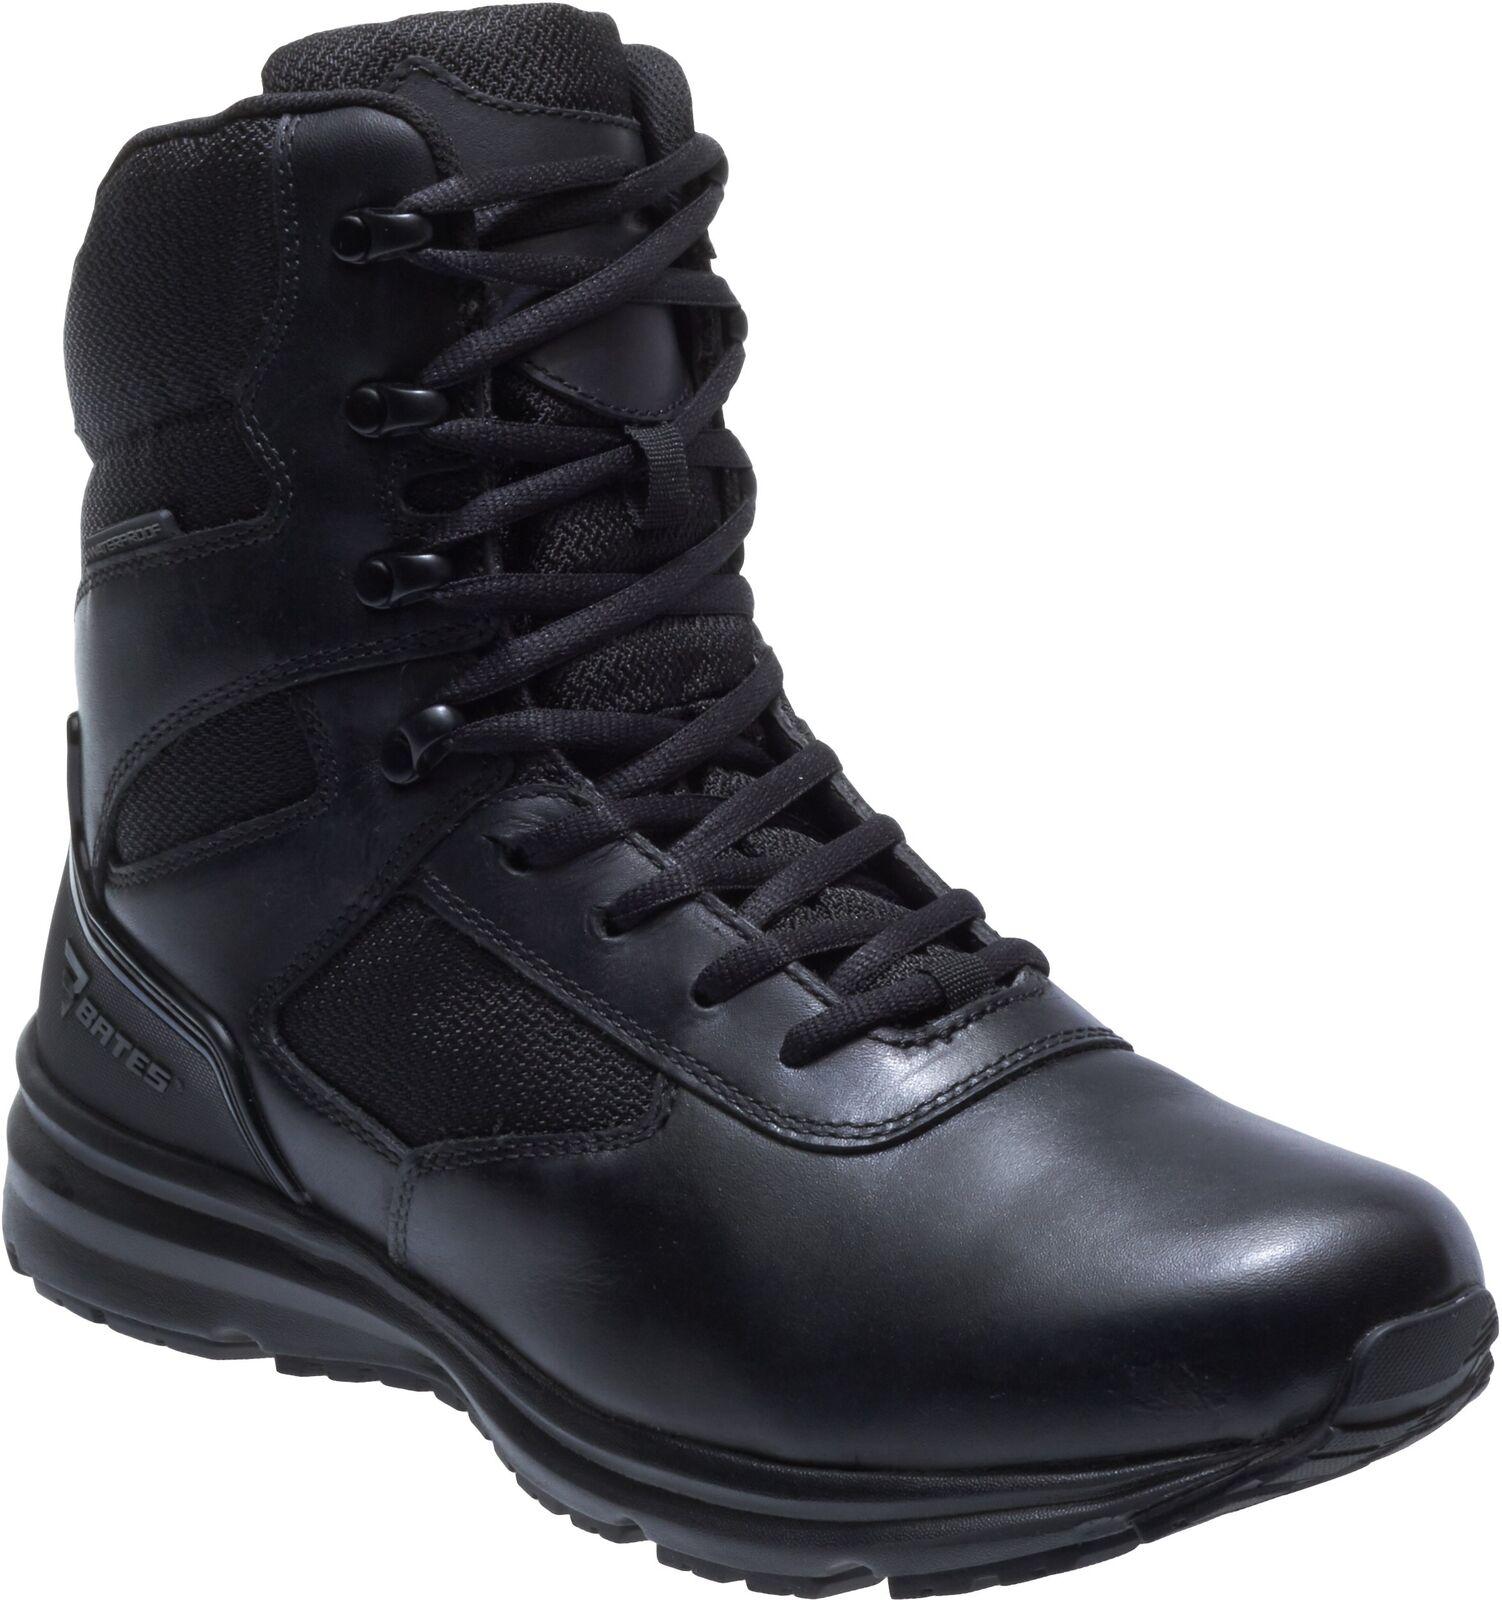 Bates 5148 Uomo Uomo Uomo 8 WP Side Zip Military and Tactical avvio FAST FREE USA SHIPPING 6e6758